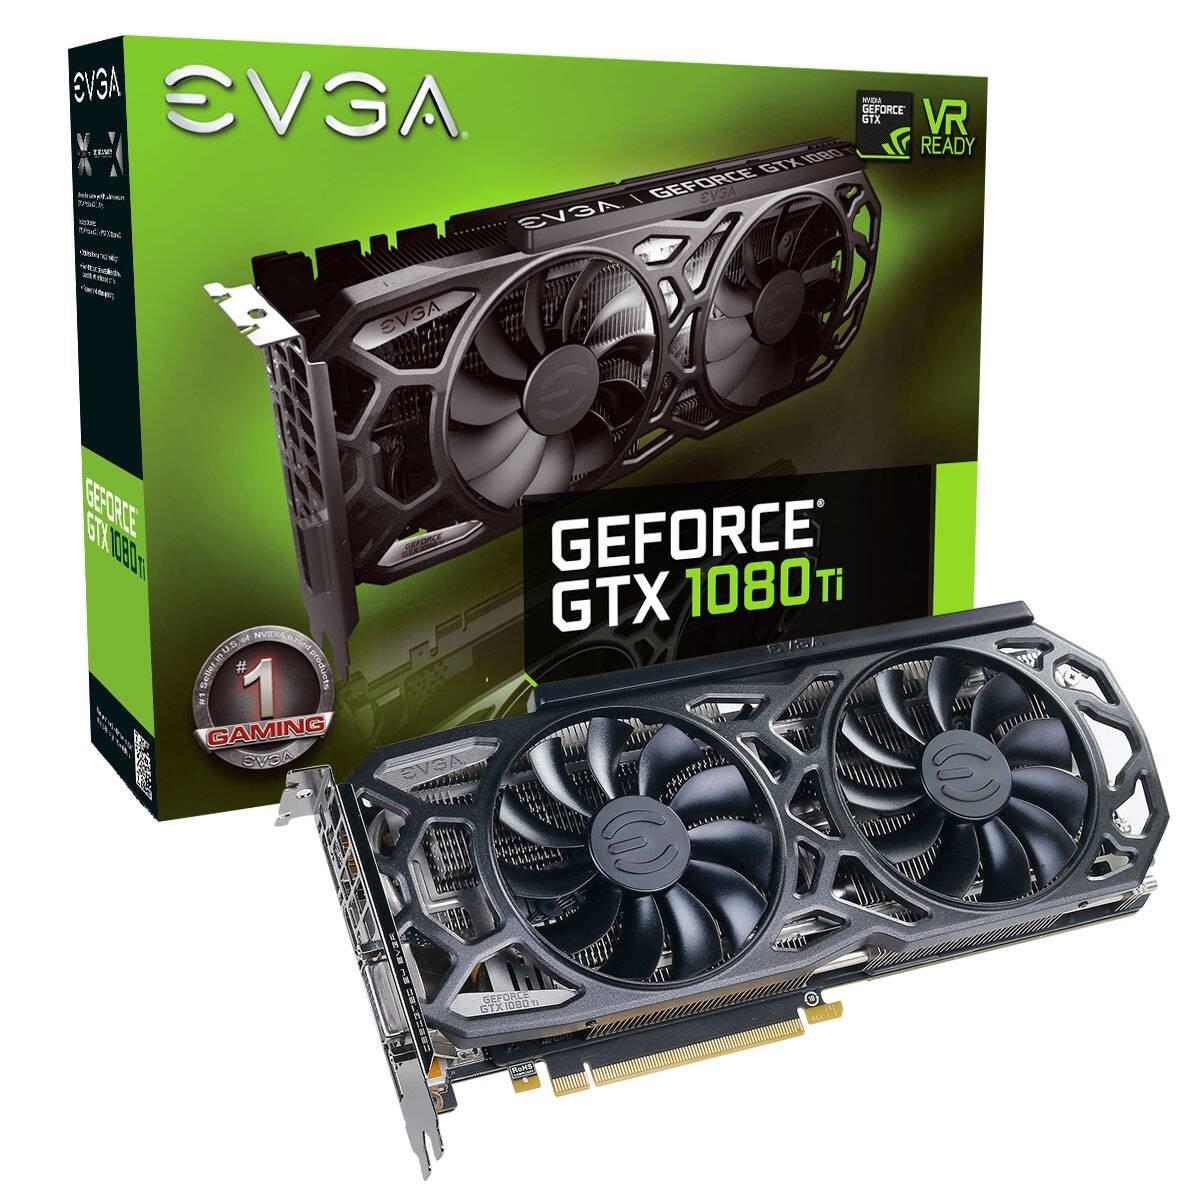 EVGA GeForce GTX 1080 Ti SC